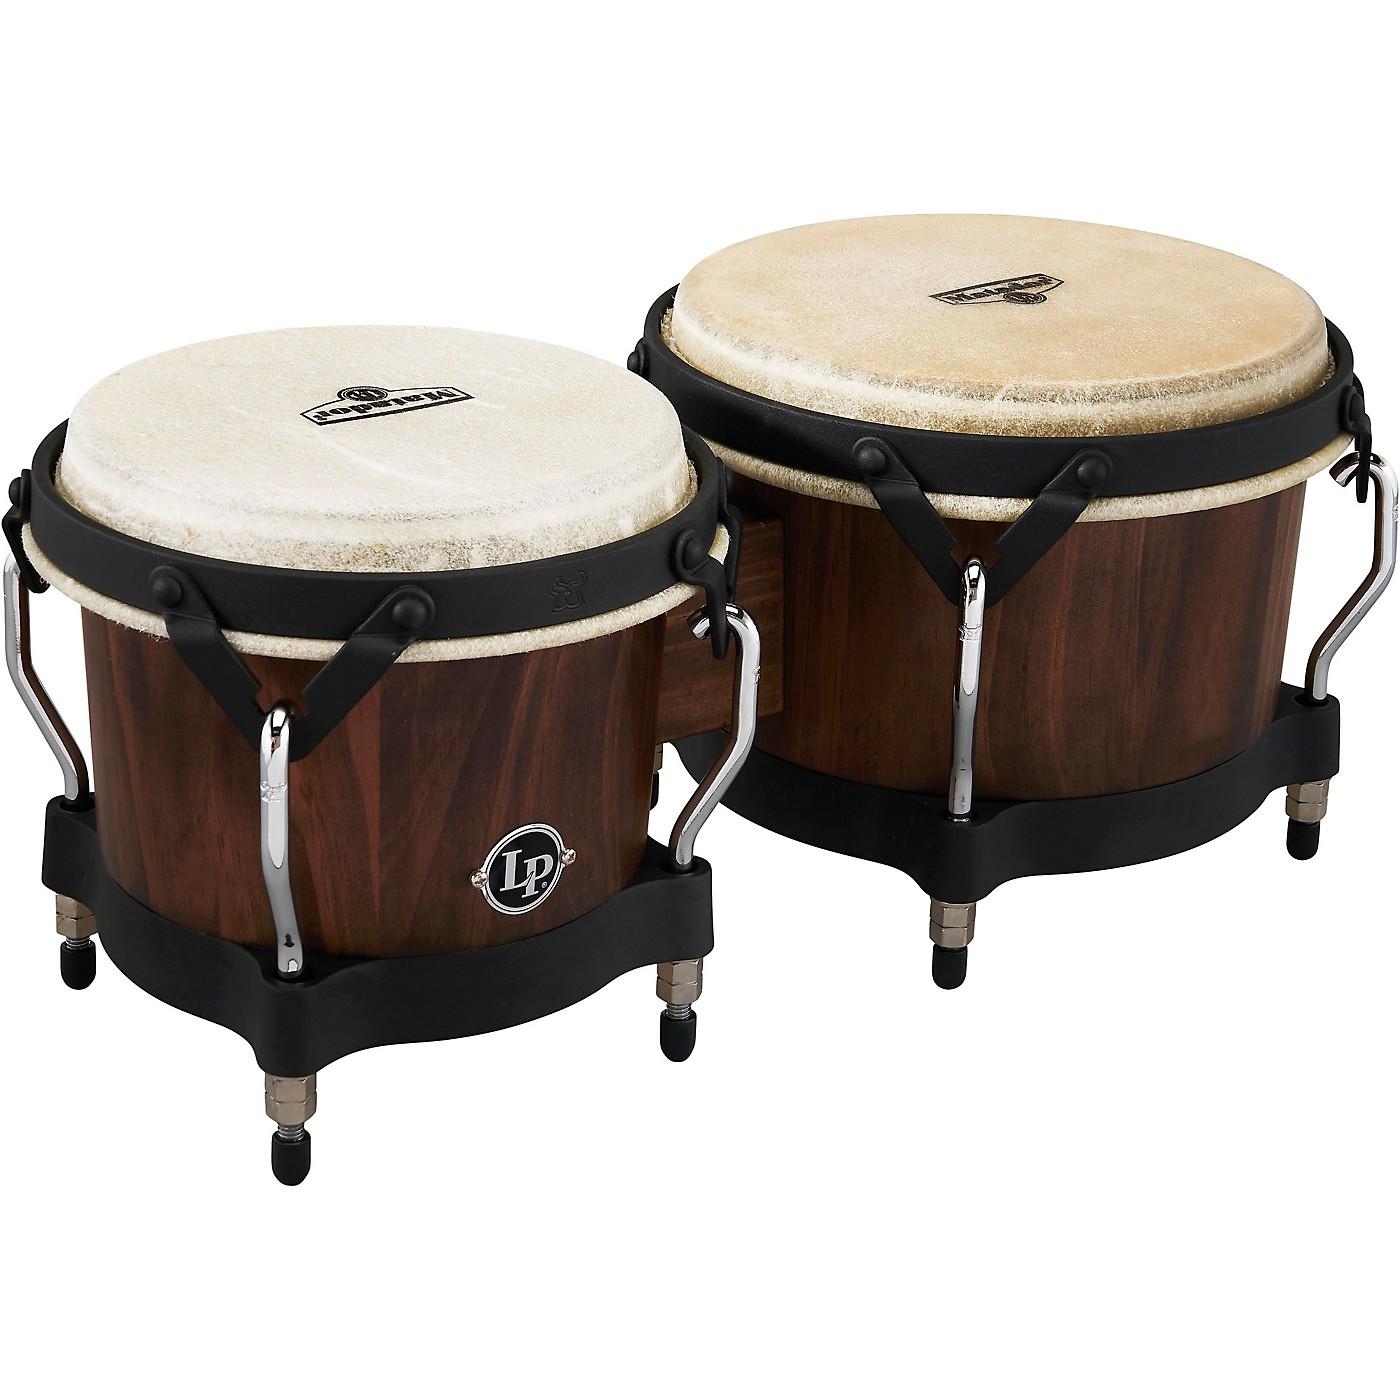 LP Matador Pine Whiskey Barrel Bongos, with Black Hardware thumbnail